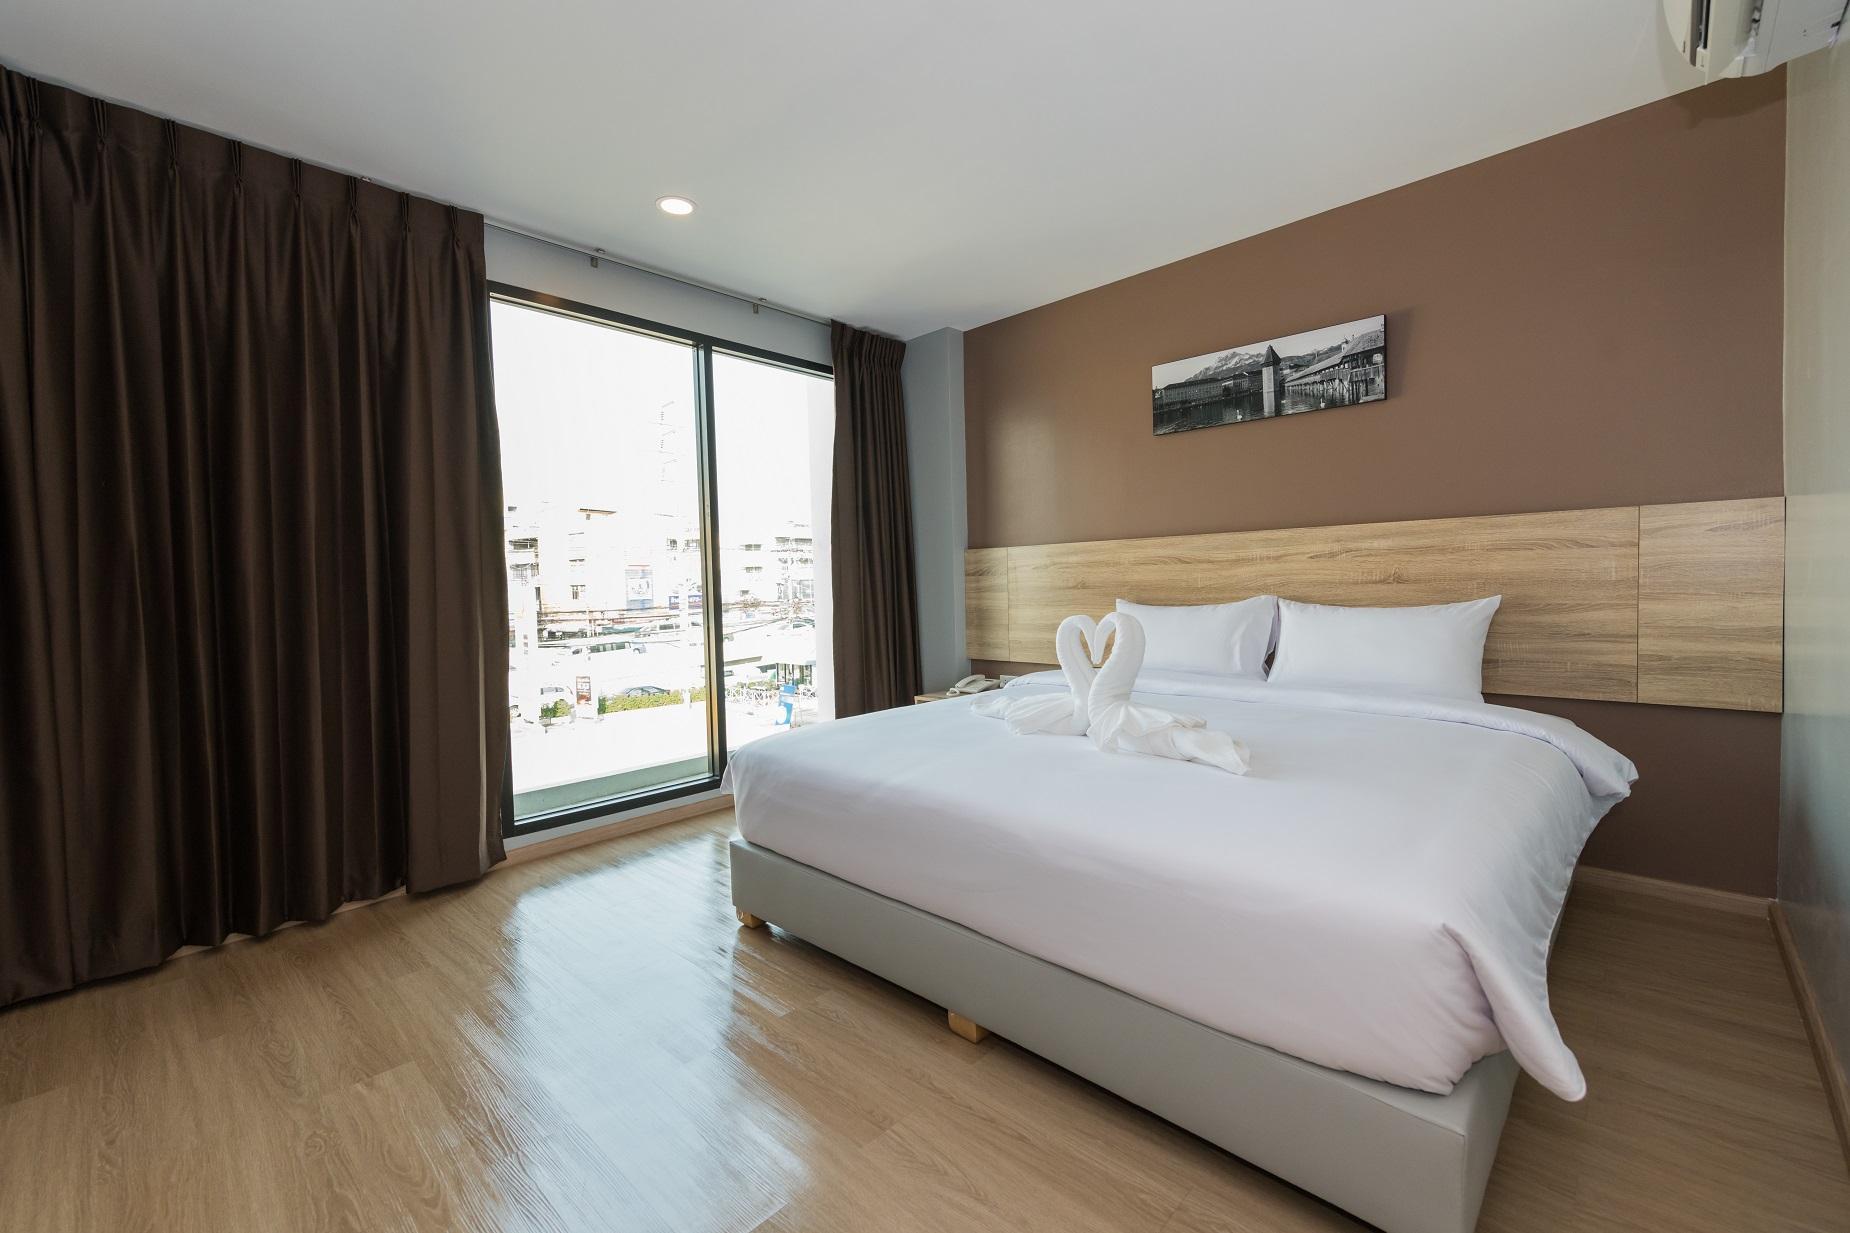 Narra hotel โรงแรมนารา